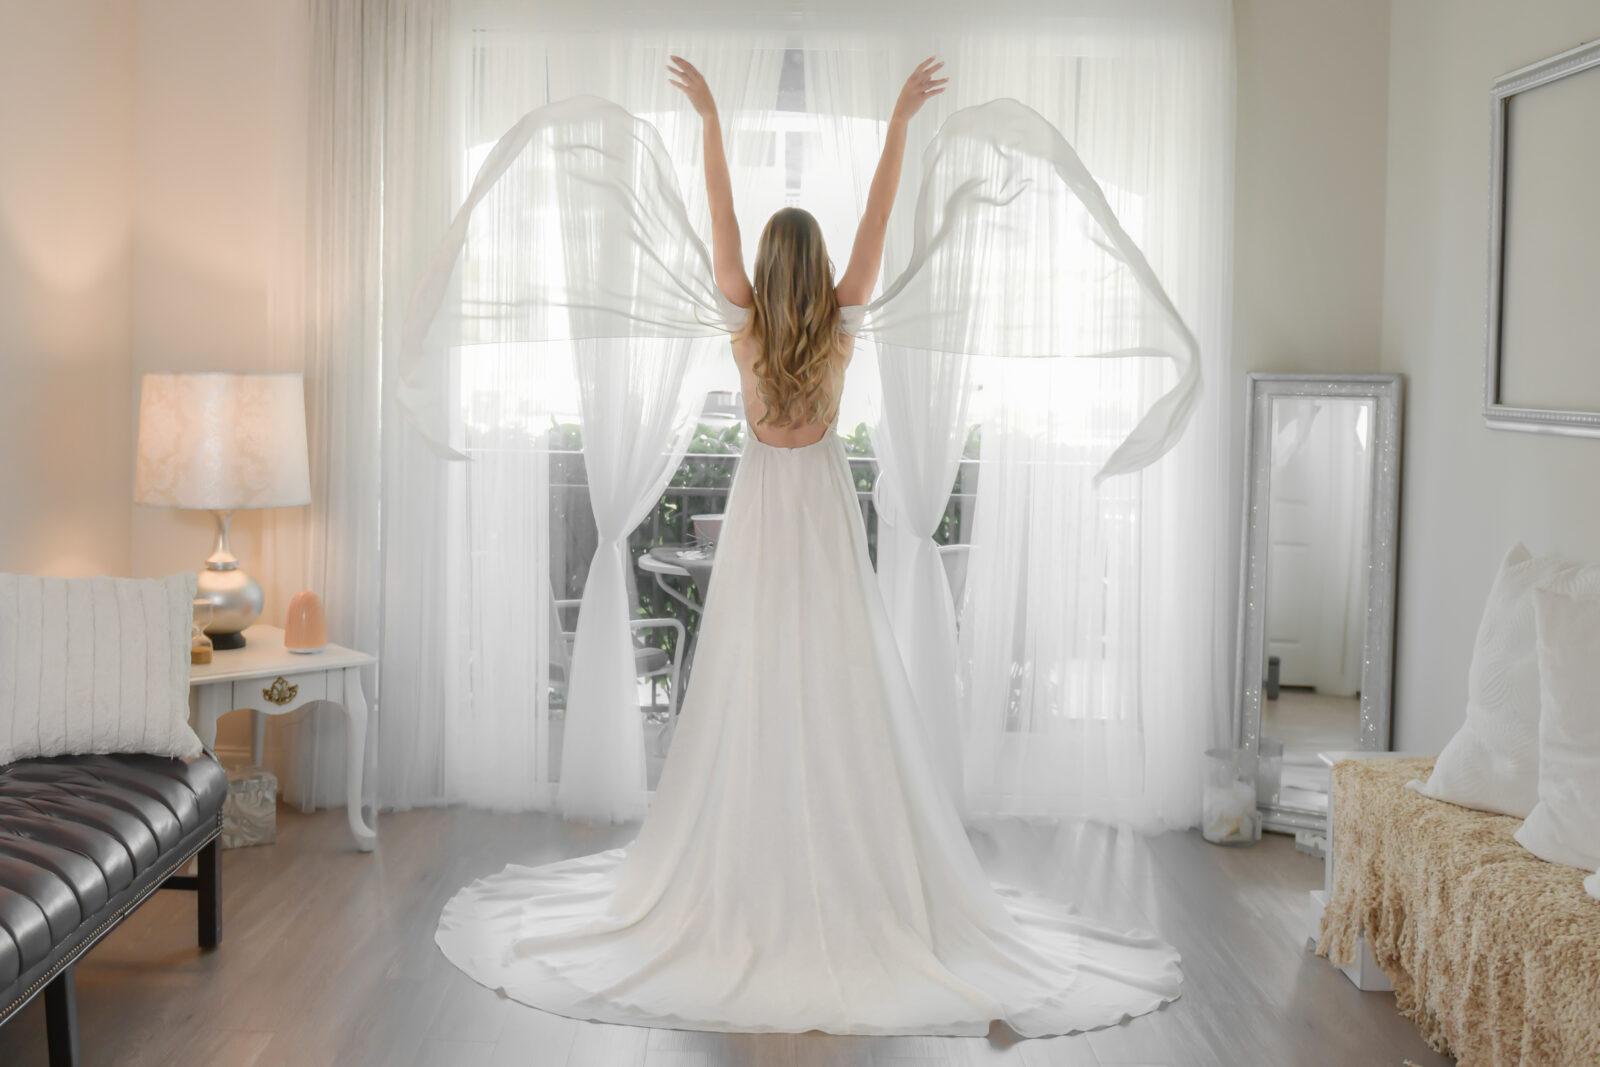 Orlando Custom Design Wedding Dress Sira D Pion,Average Cost Of Wedding Dress Canada